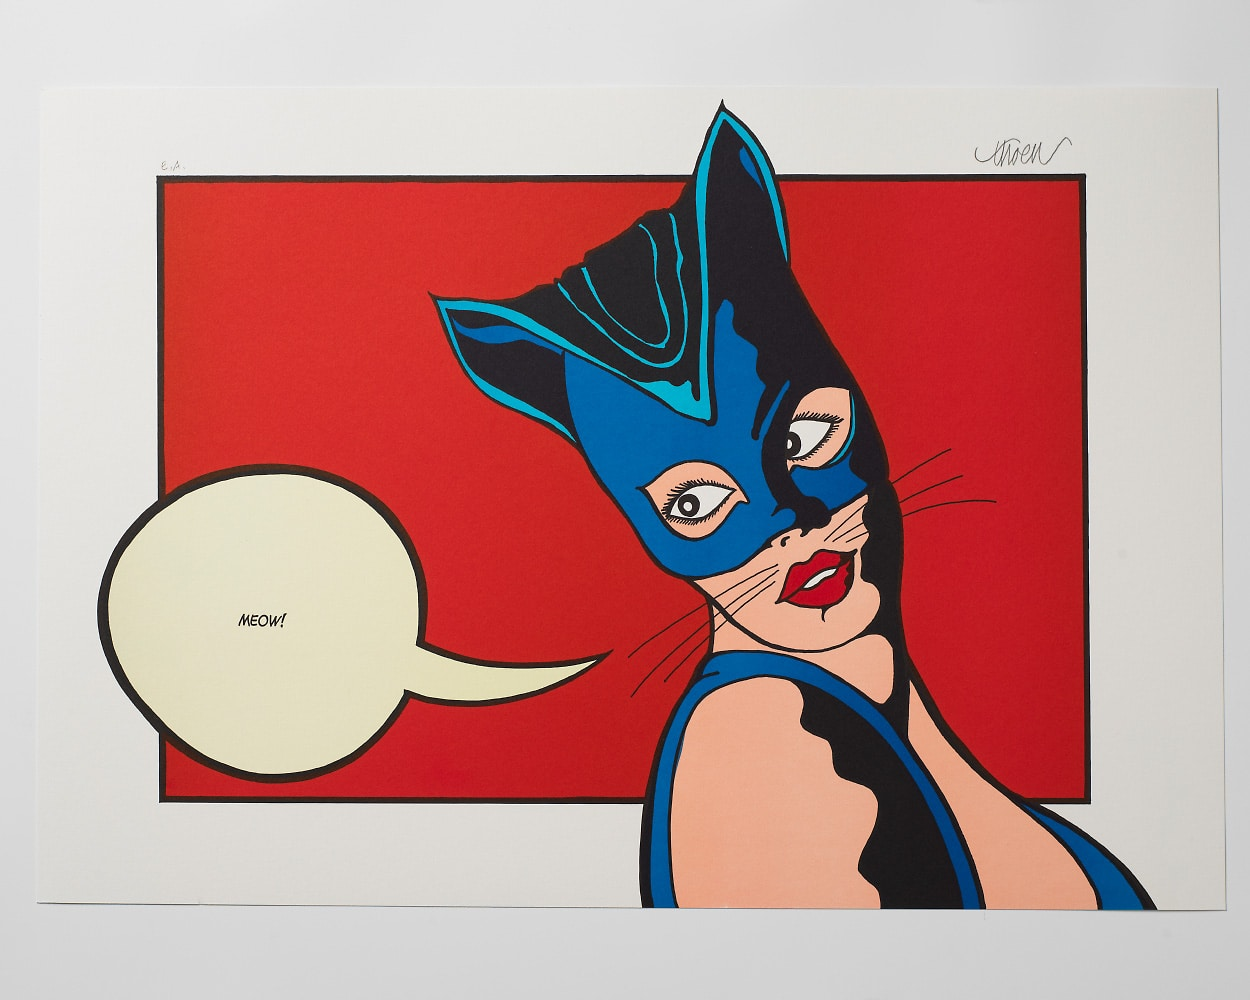 Peter Thoen - Catwoman